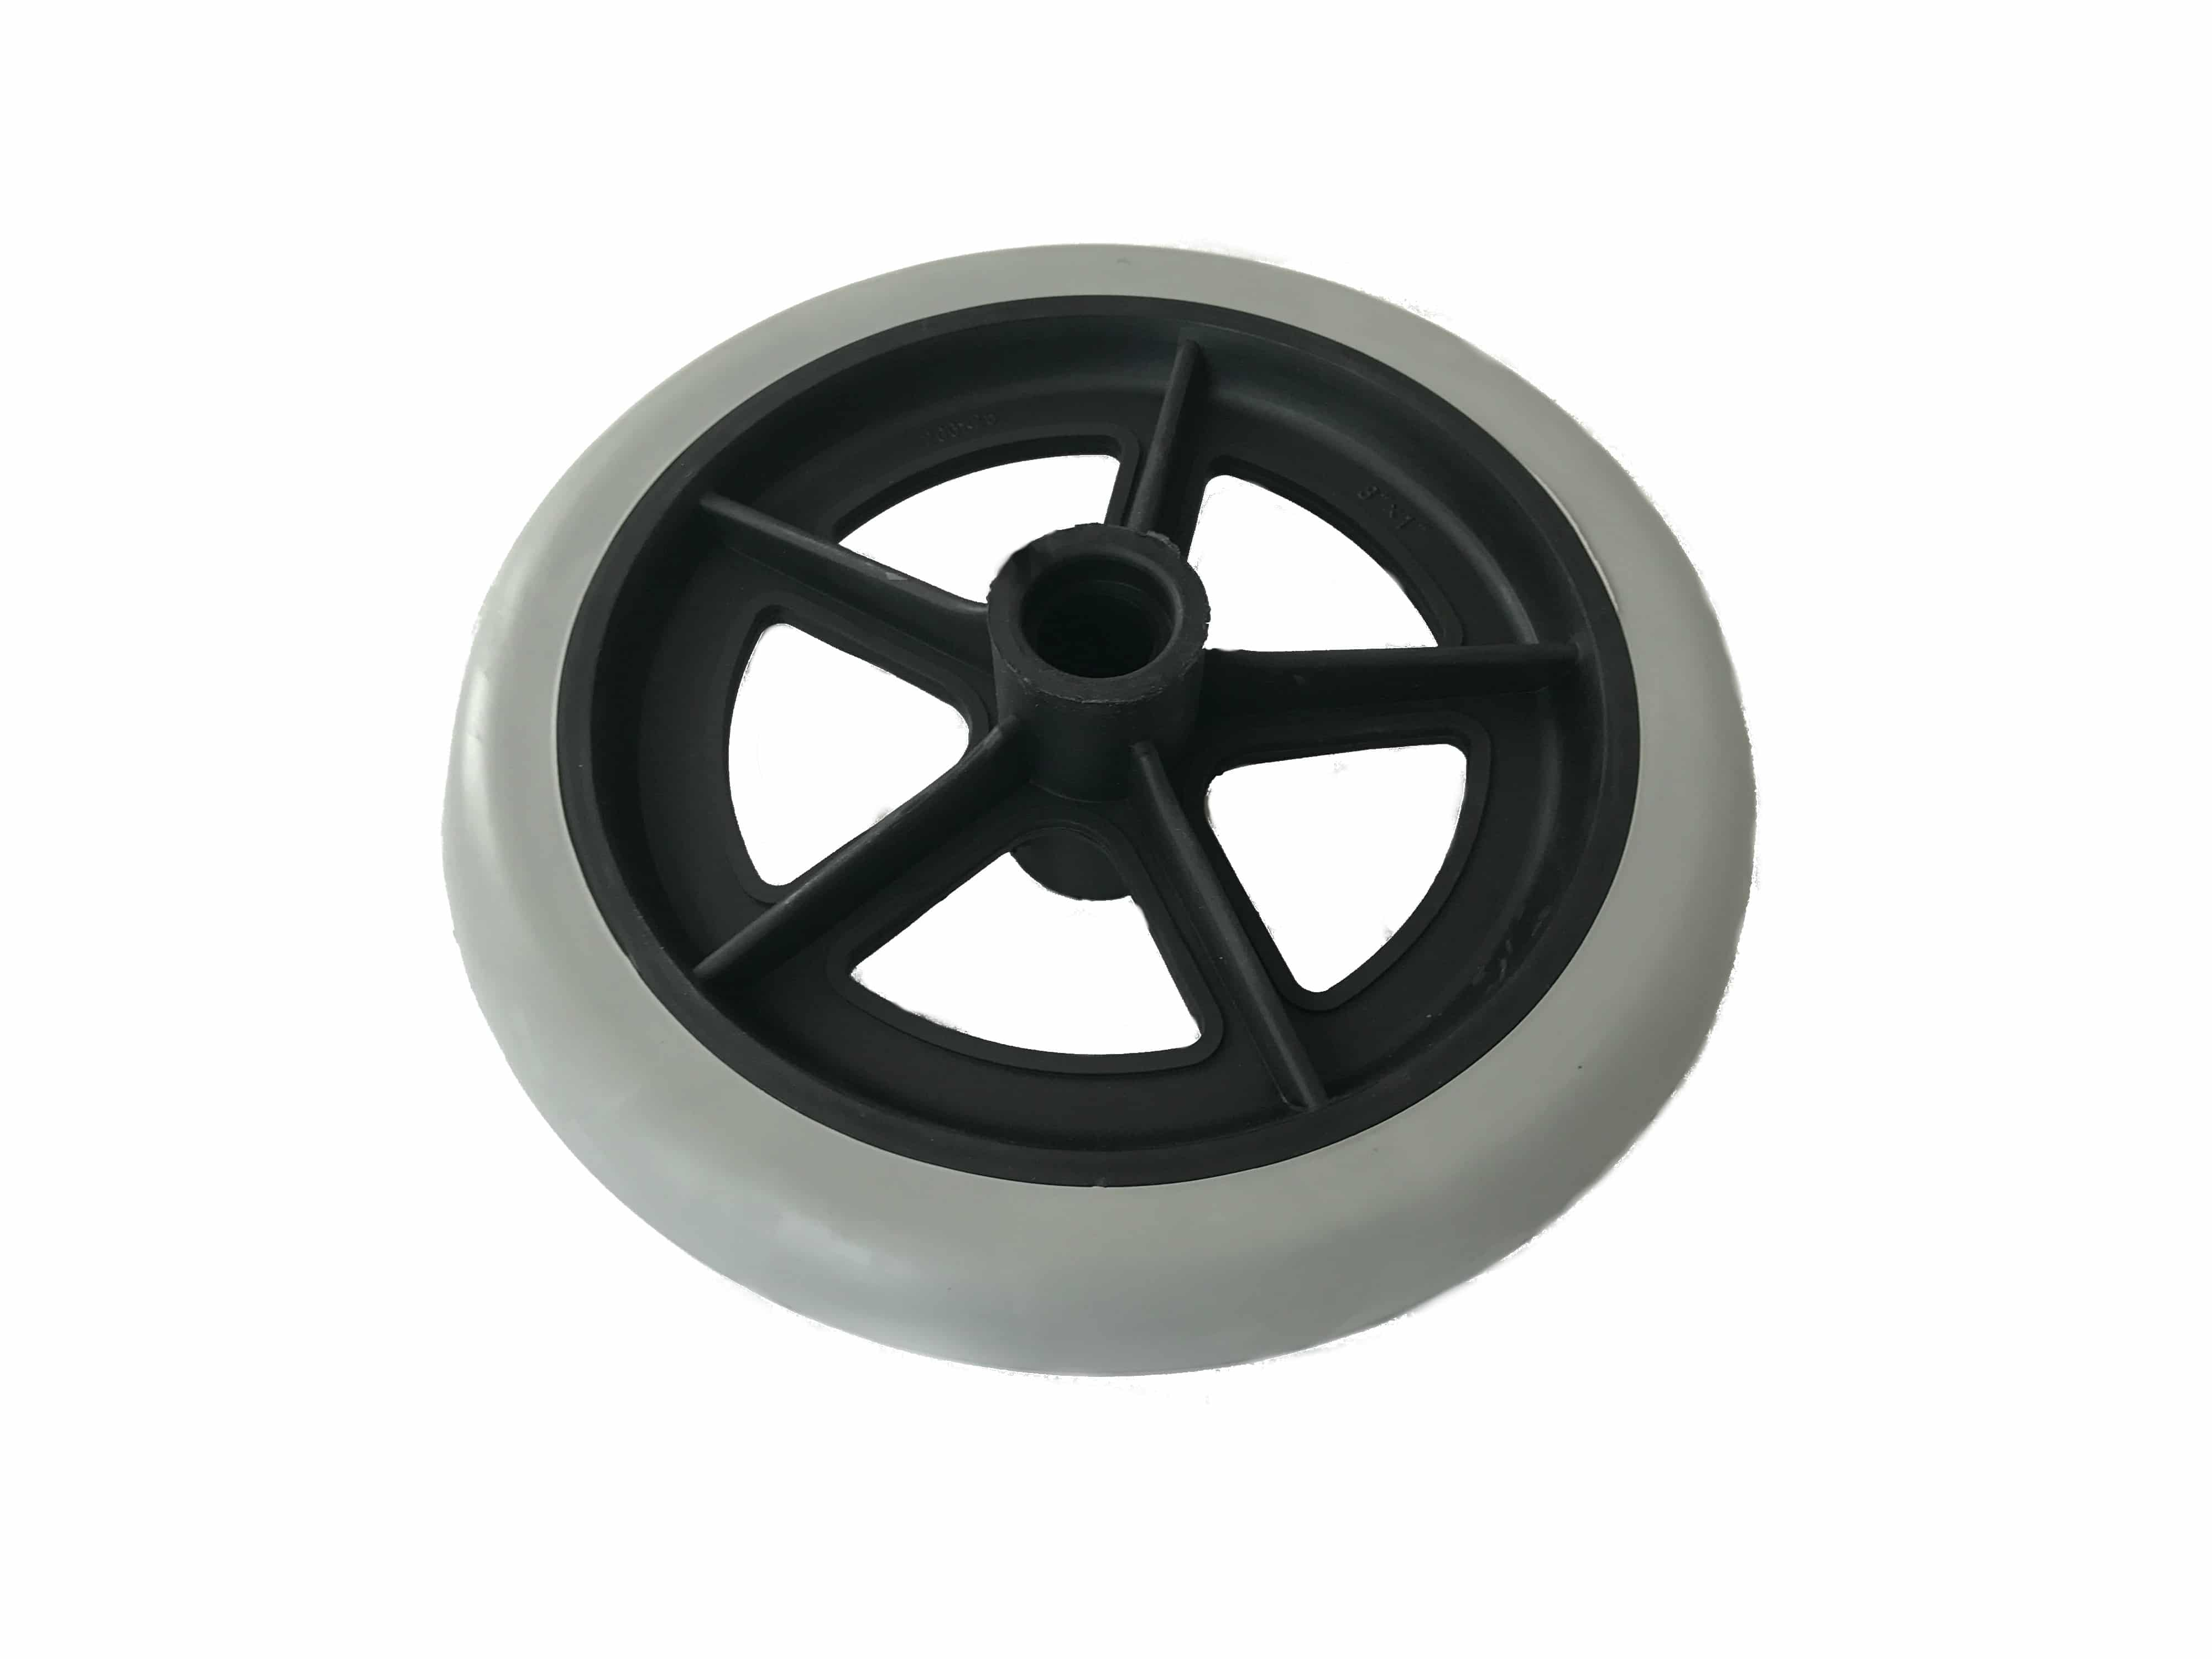 8-Front-Castor-Wheel-MDG0001